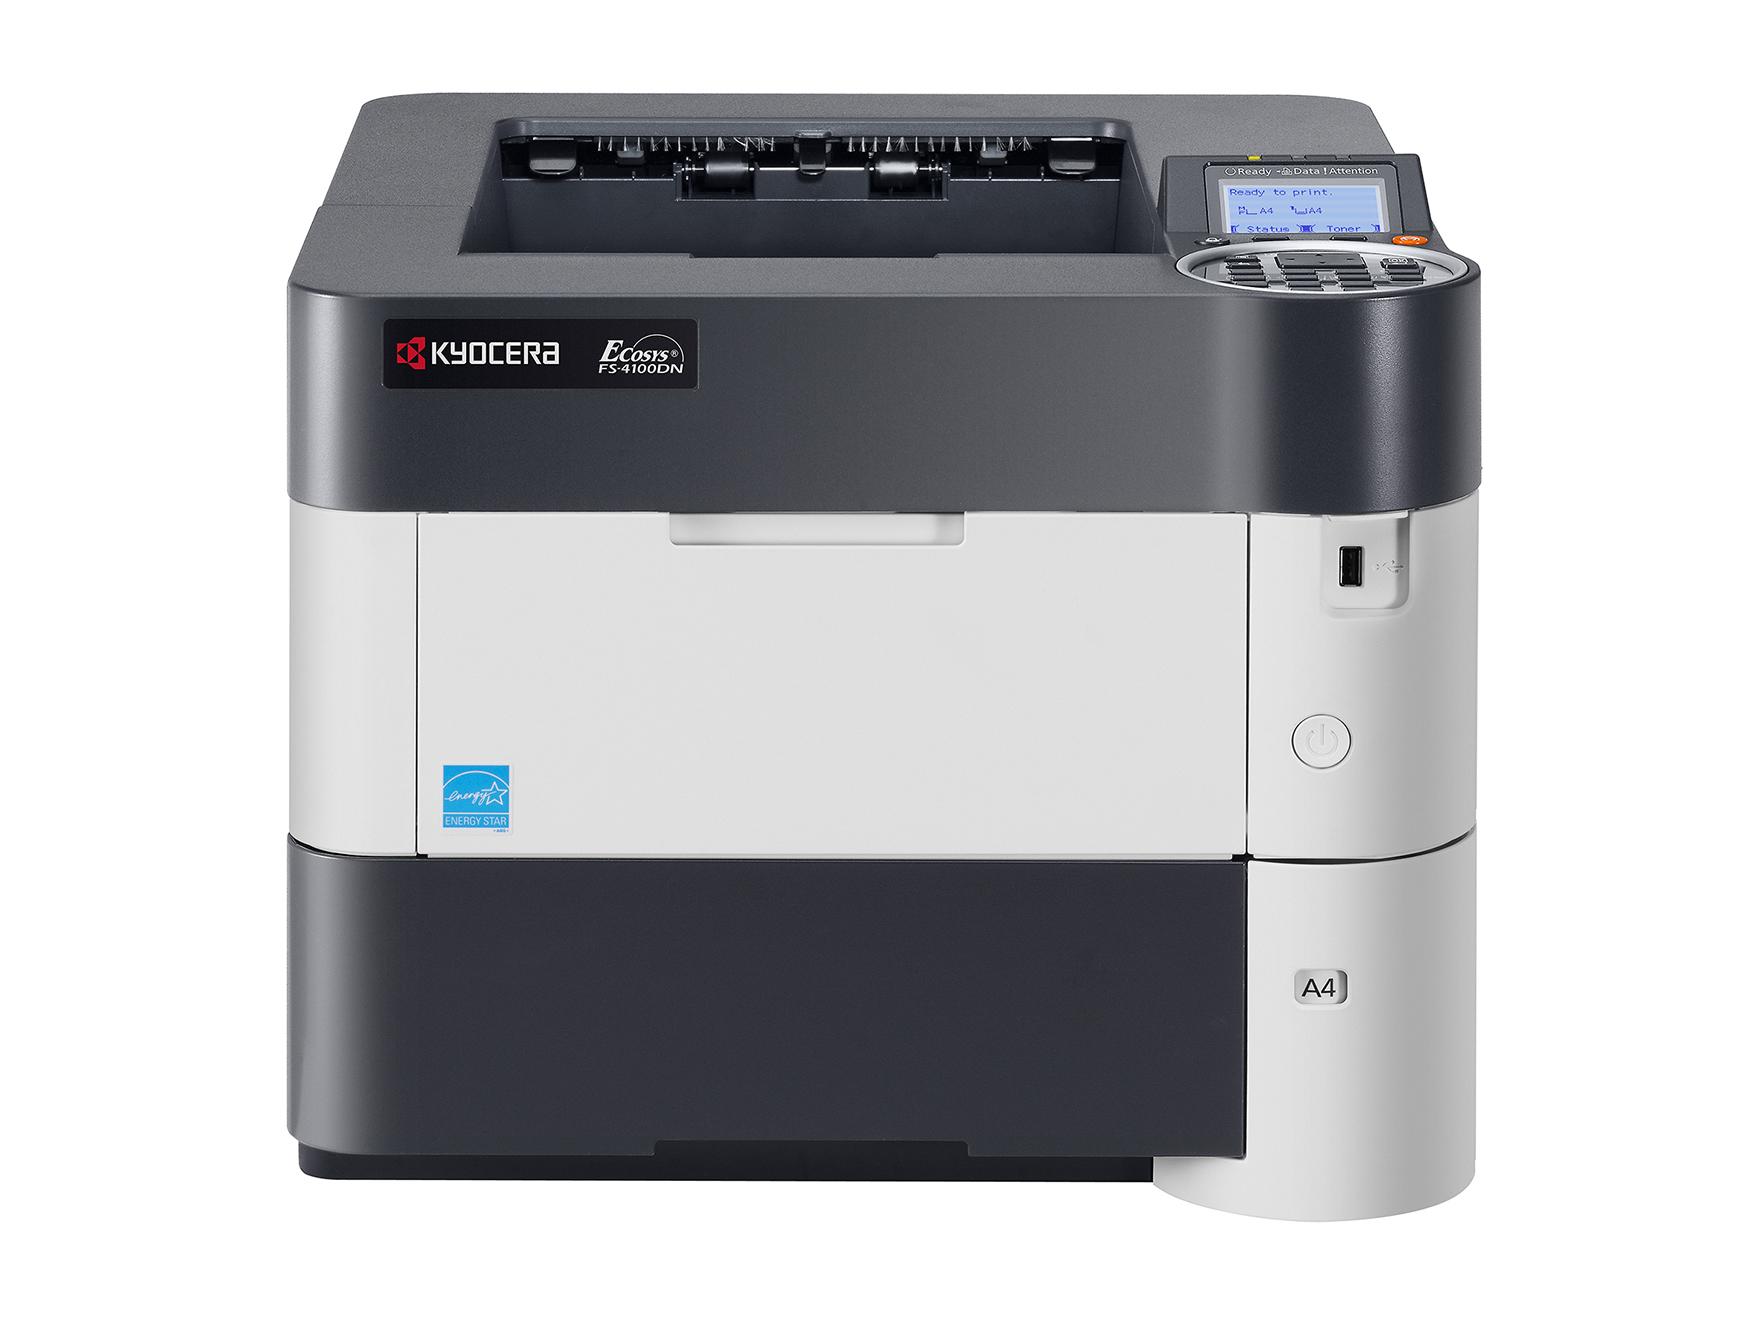 Kyocera FS4100DN A4 Mono Laser Printer